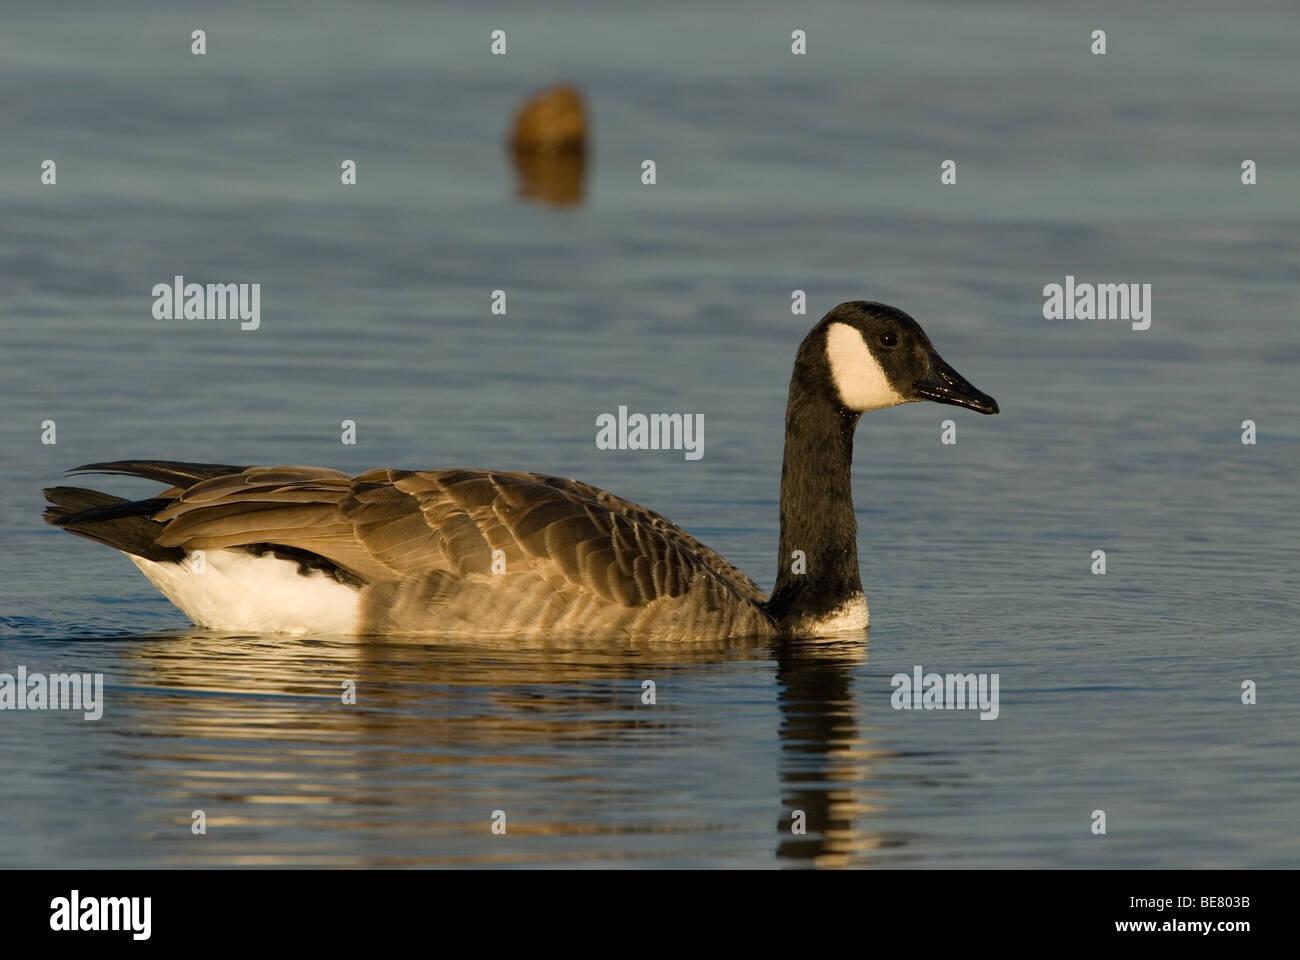 Een zwemmende Canadese Gans,A swimming Canada Goose. Stock Photo